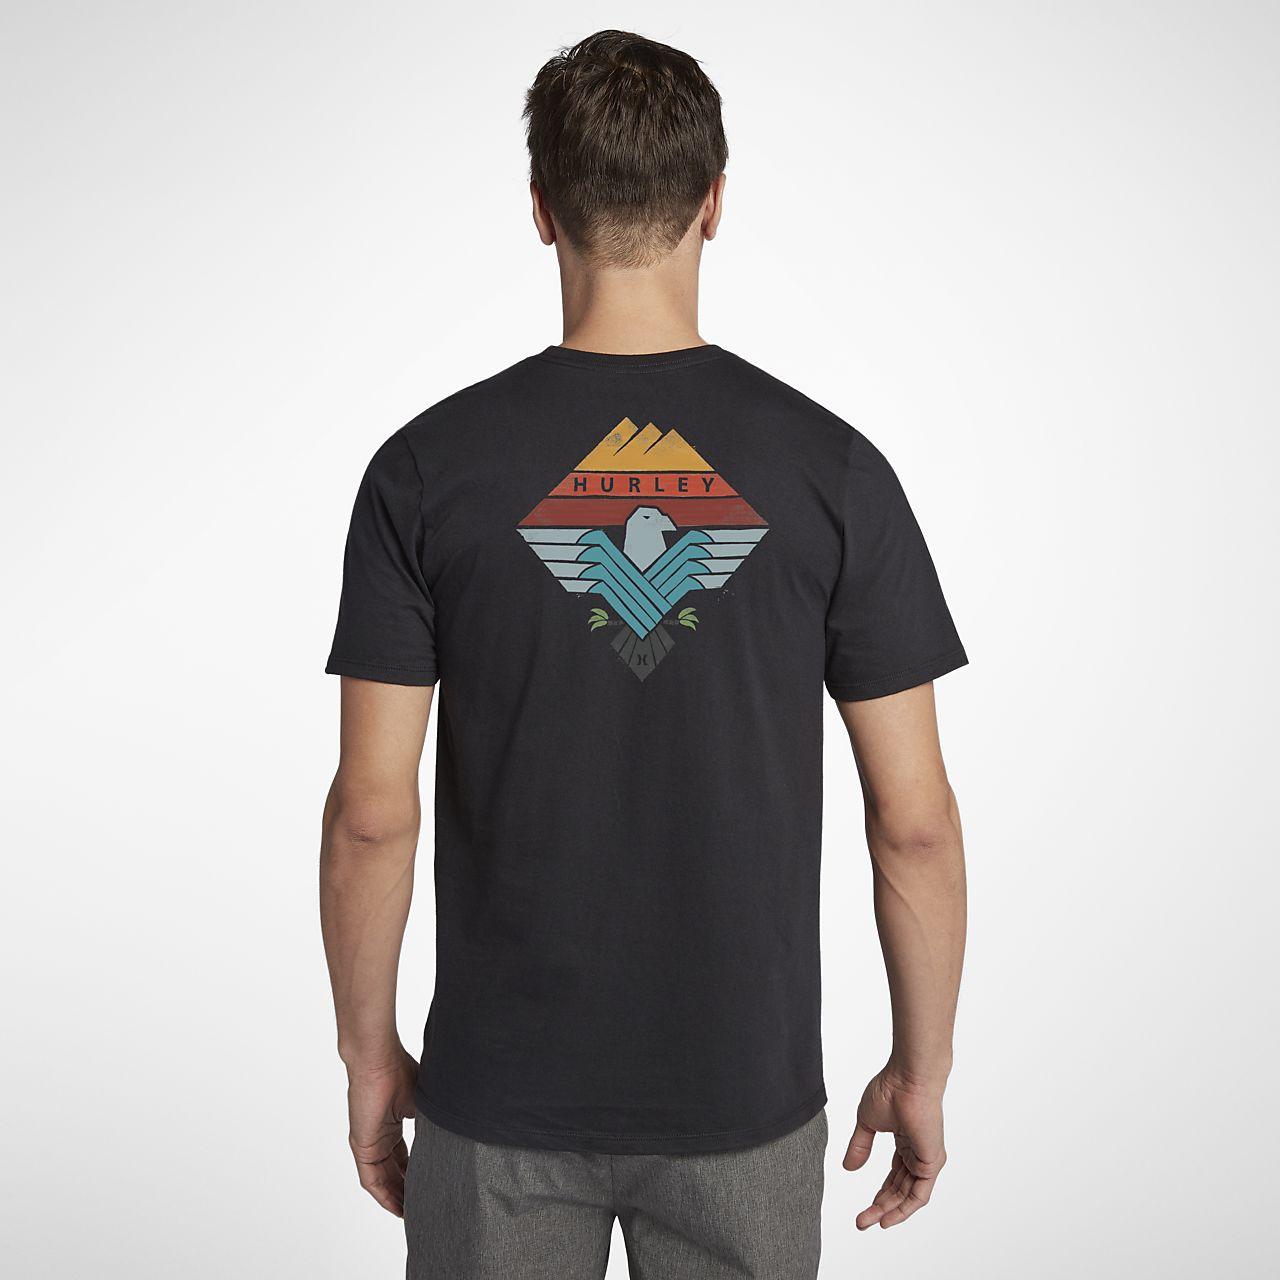 ... Hurley Surfin Bird Men's T-Shirt